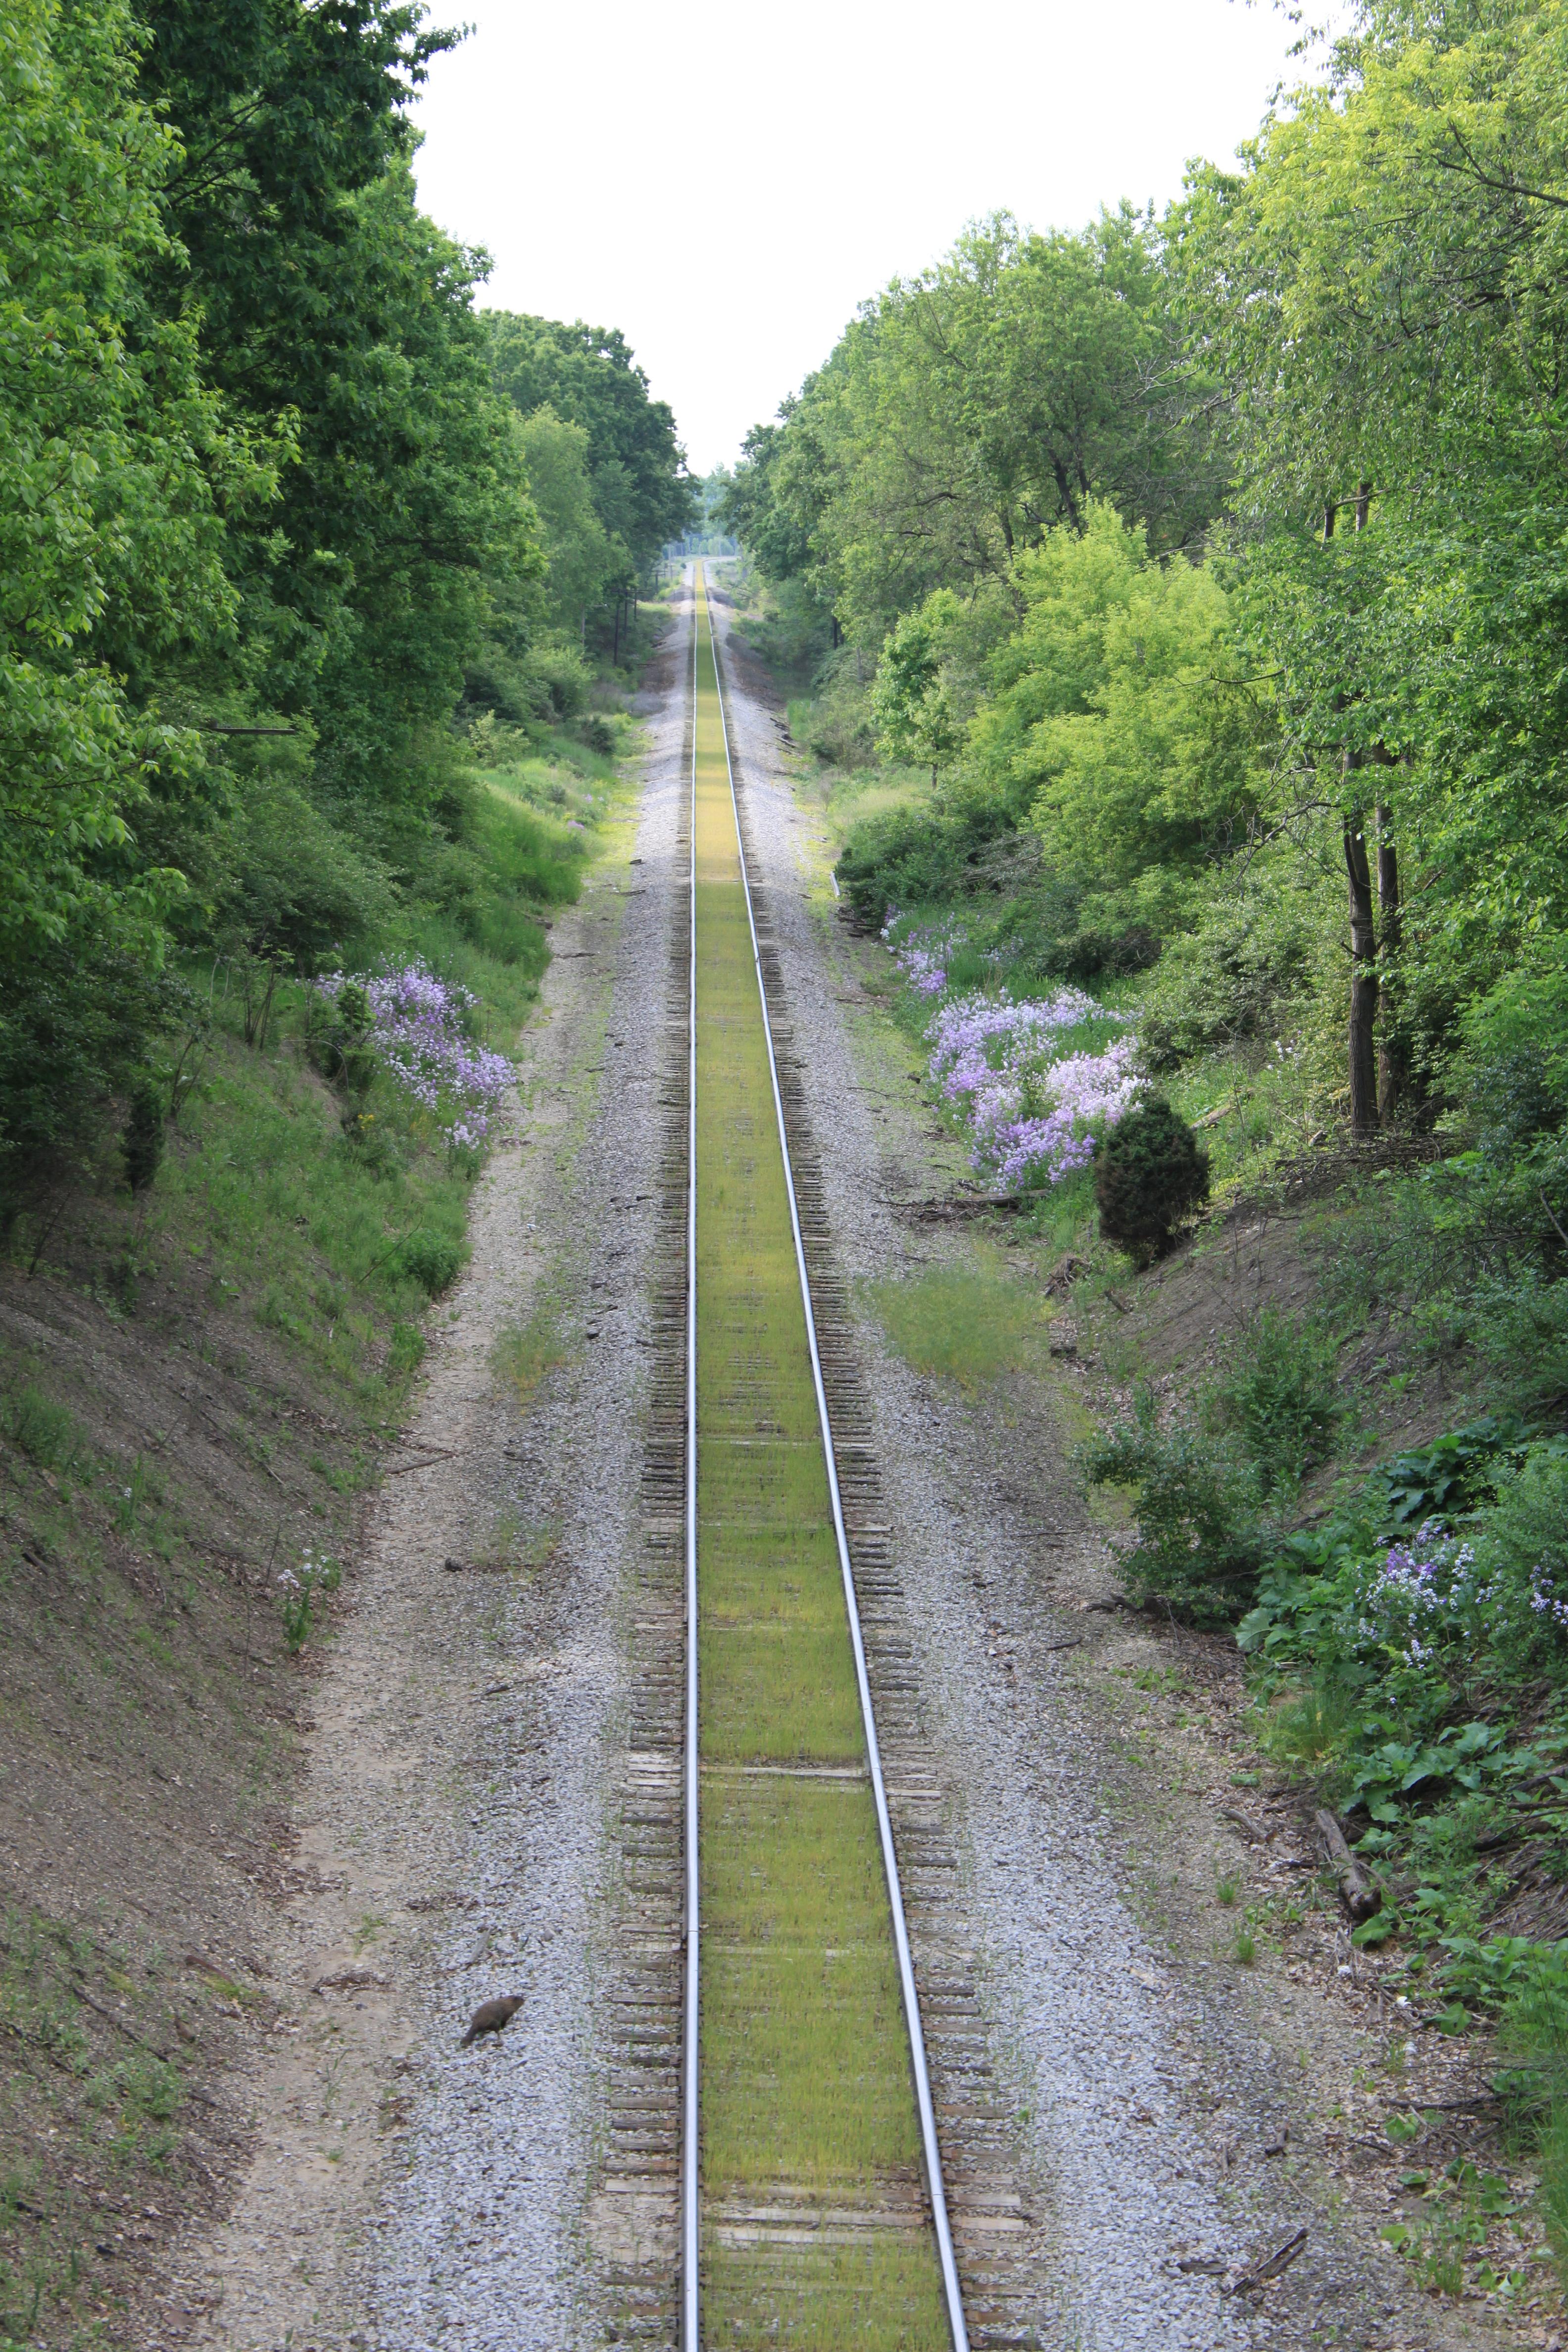 File:Railroad tracks from Bridge on Judd Road York Townshipyork township